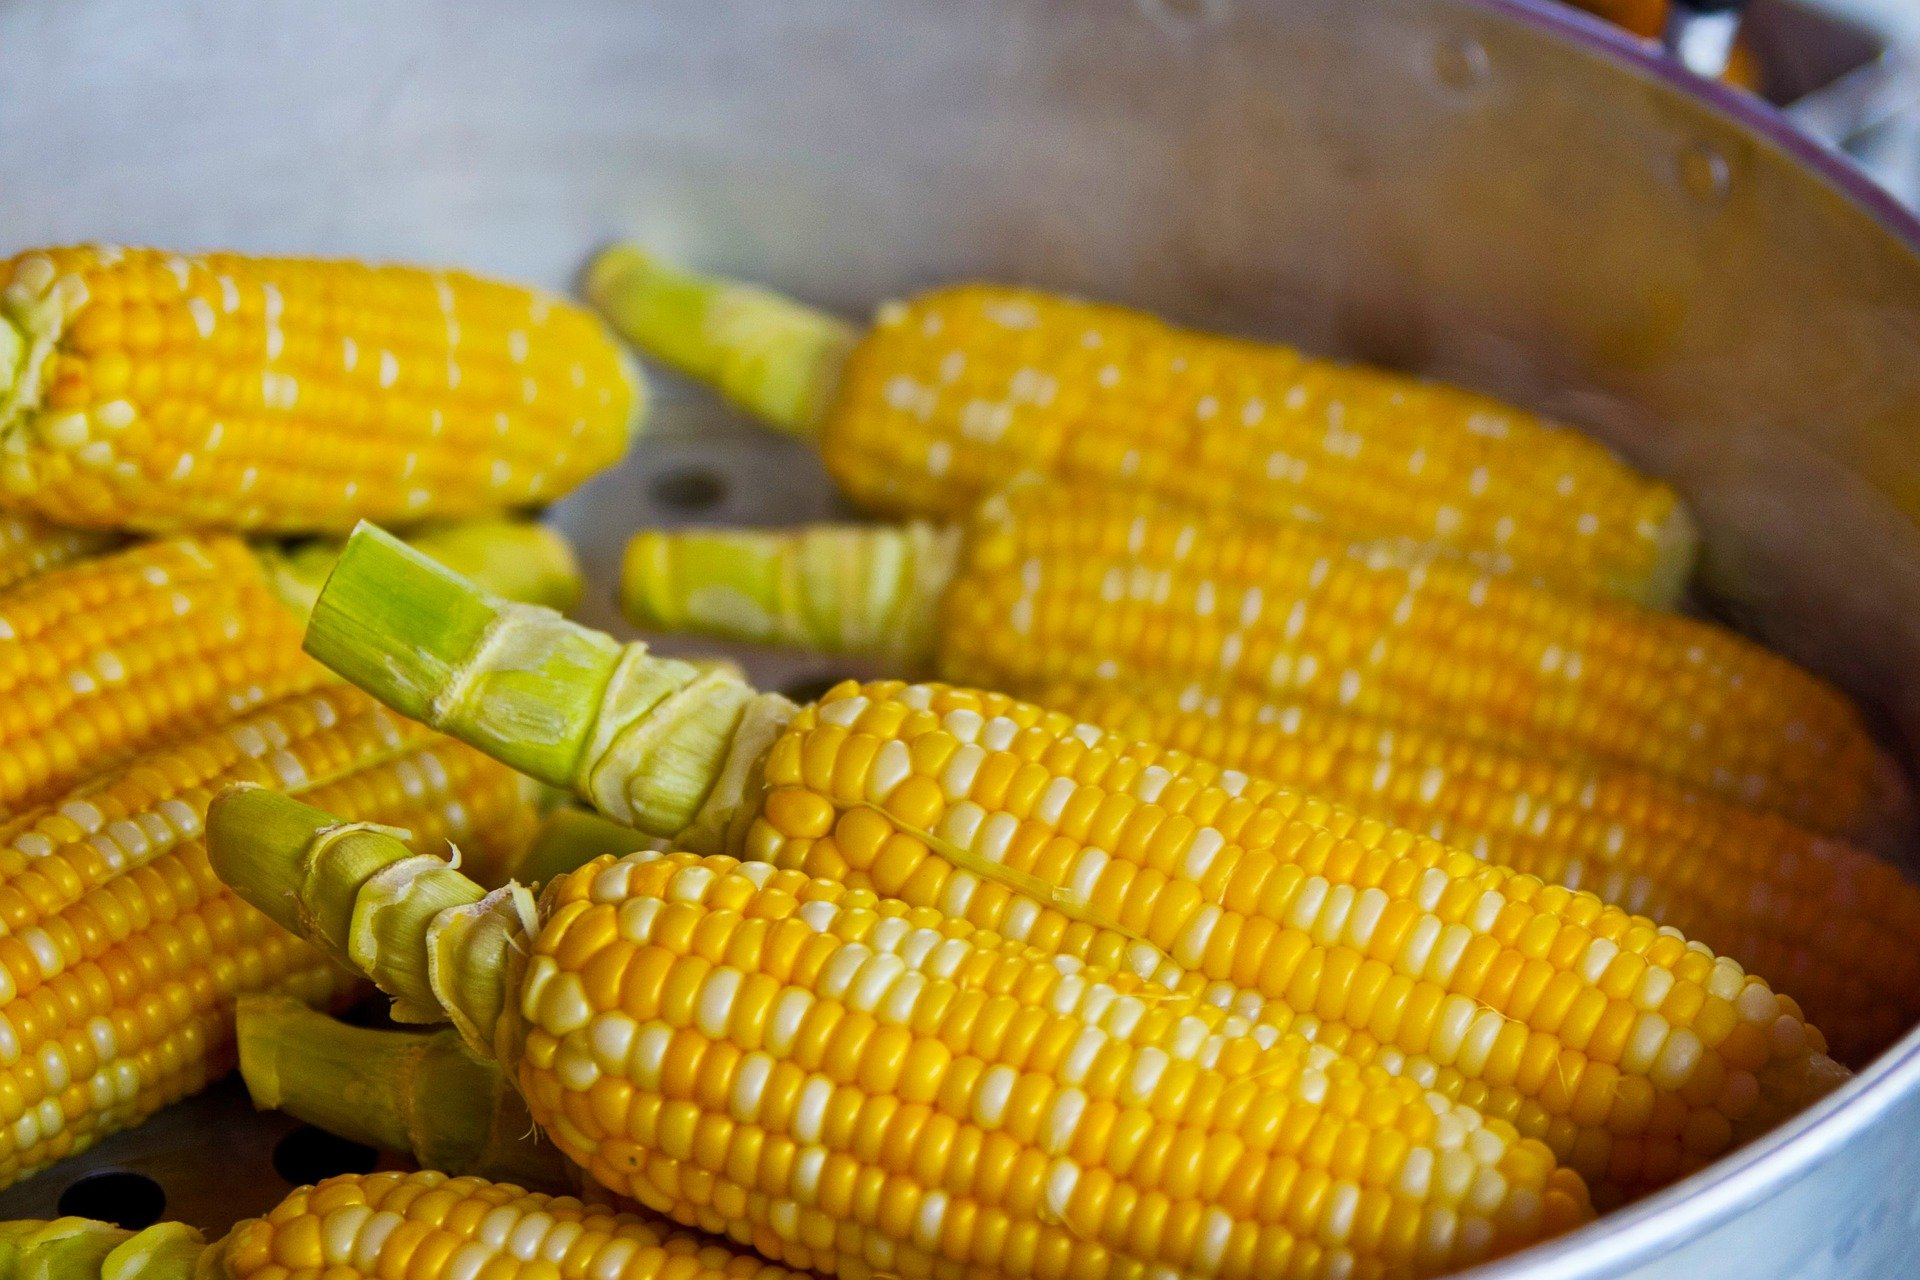 Corn causes rare food allergies